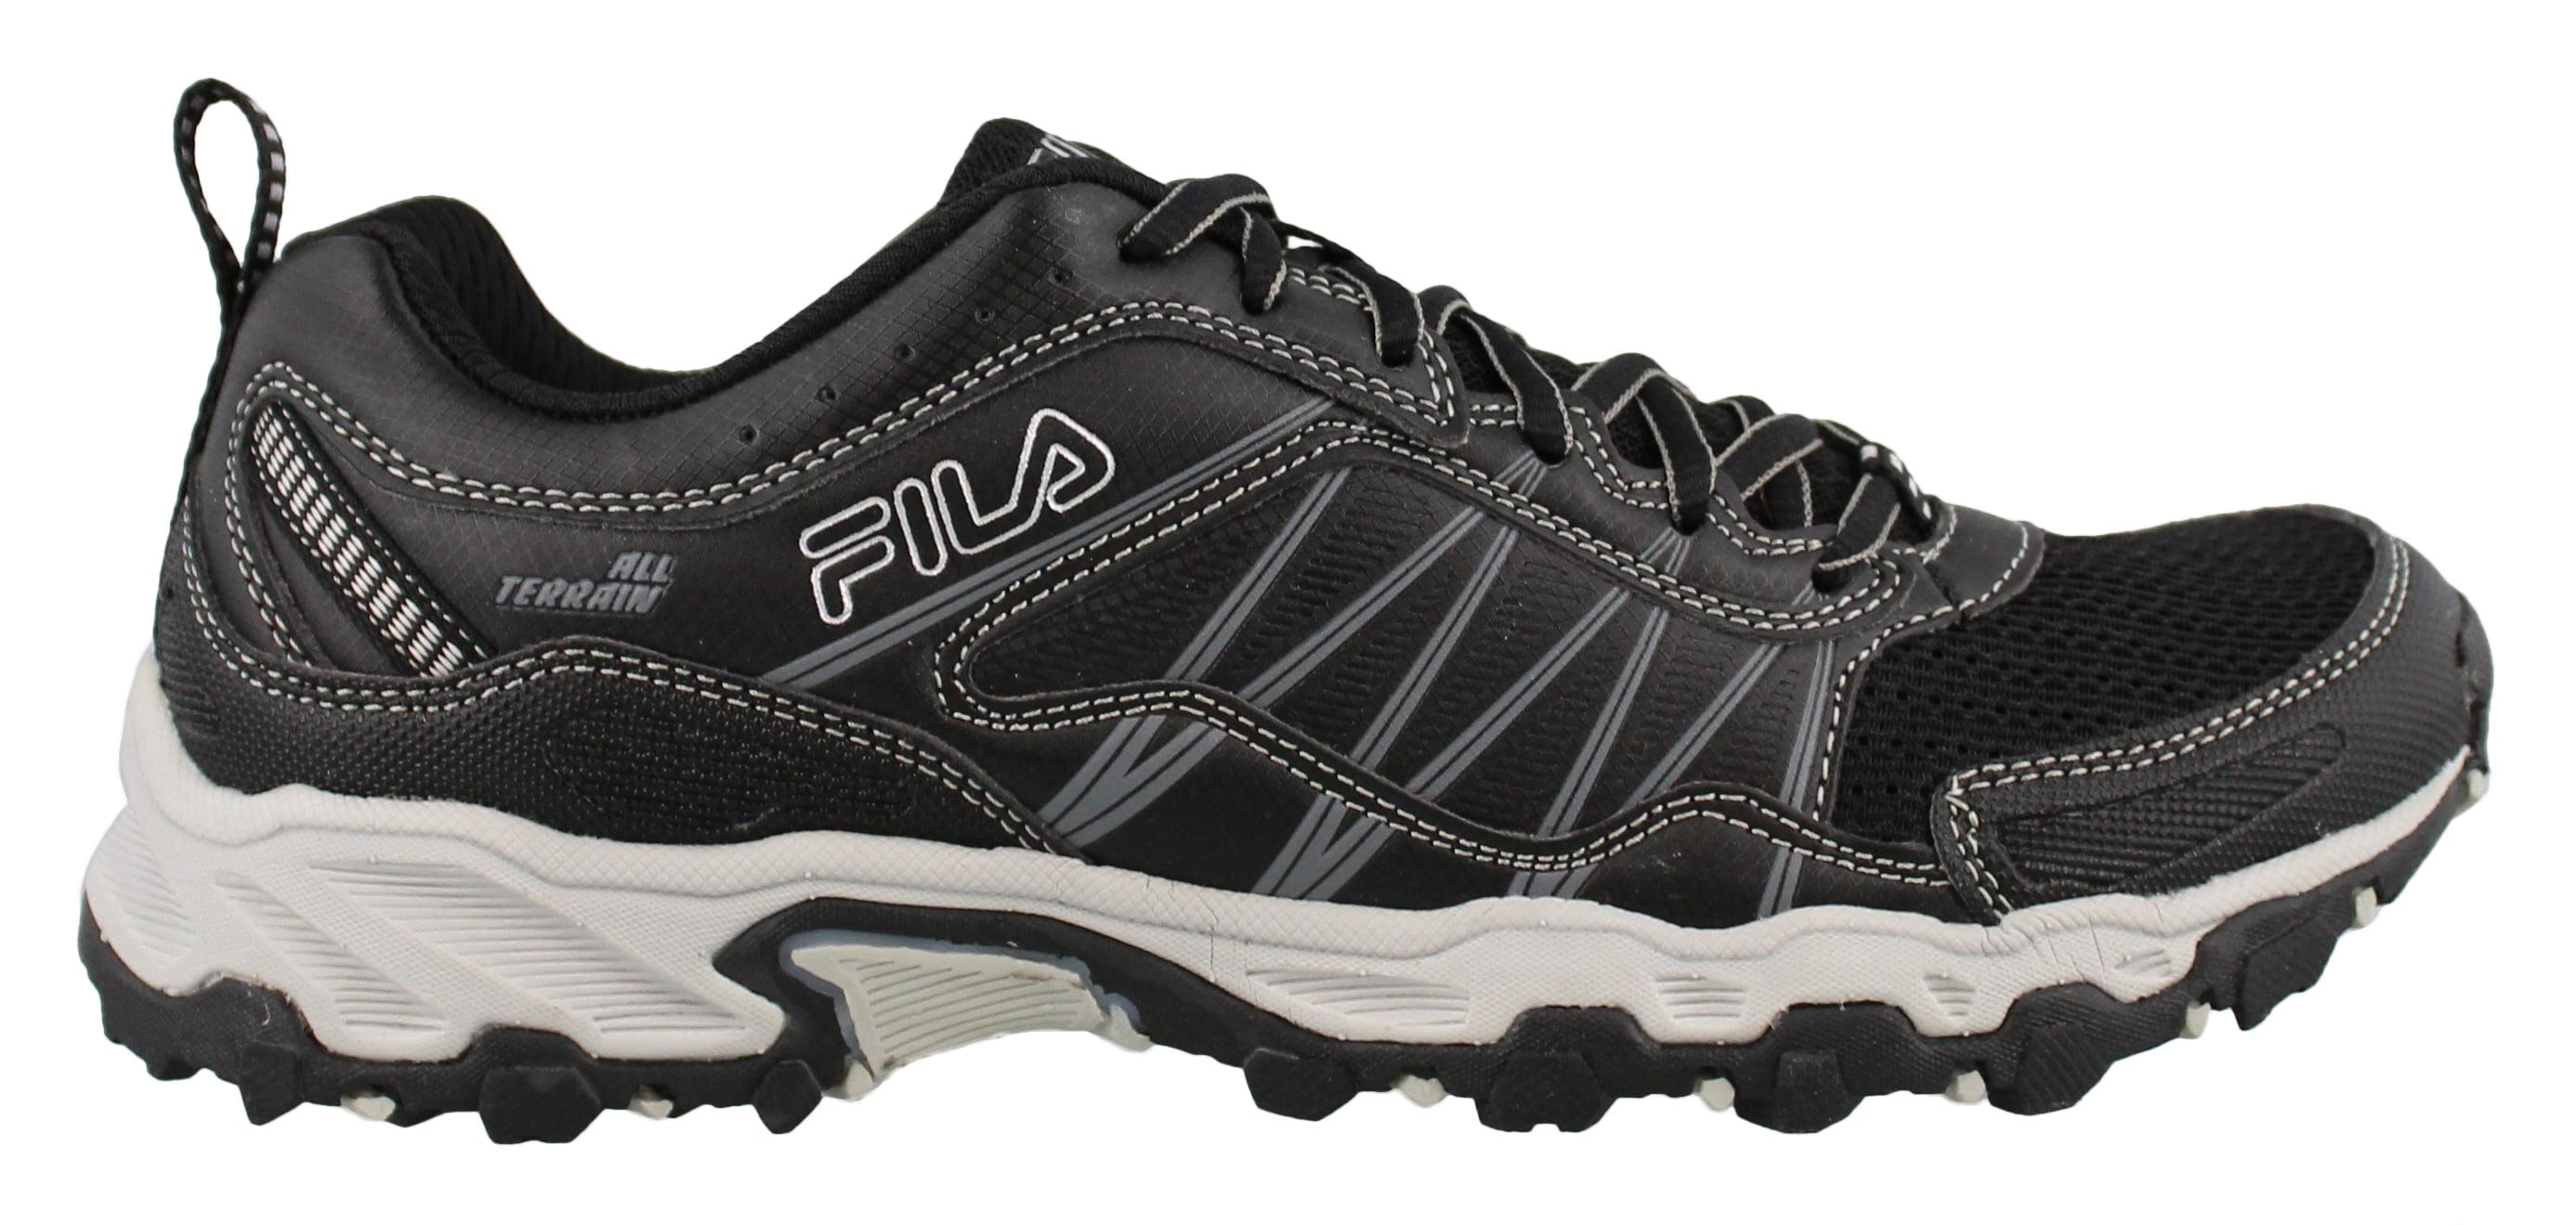 Men's Fila, At Peake 18 Trail Running Sneakers by Fila